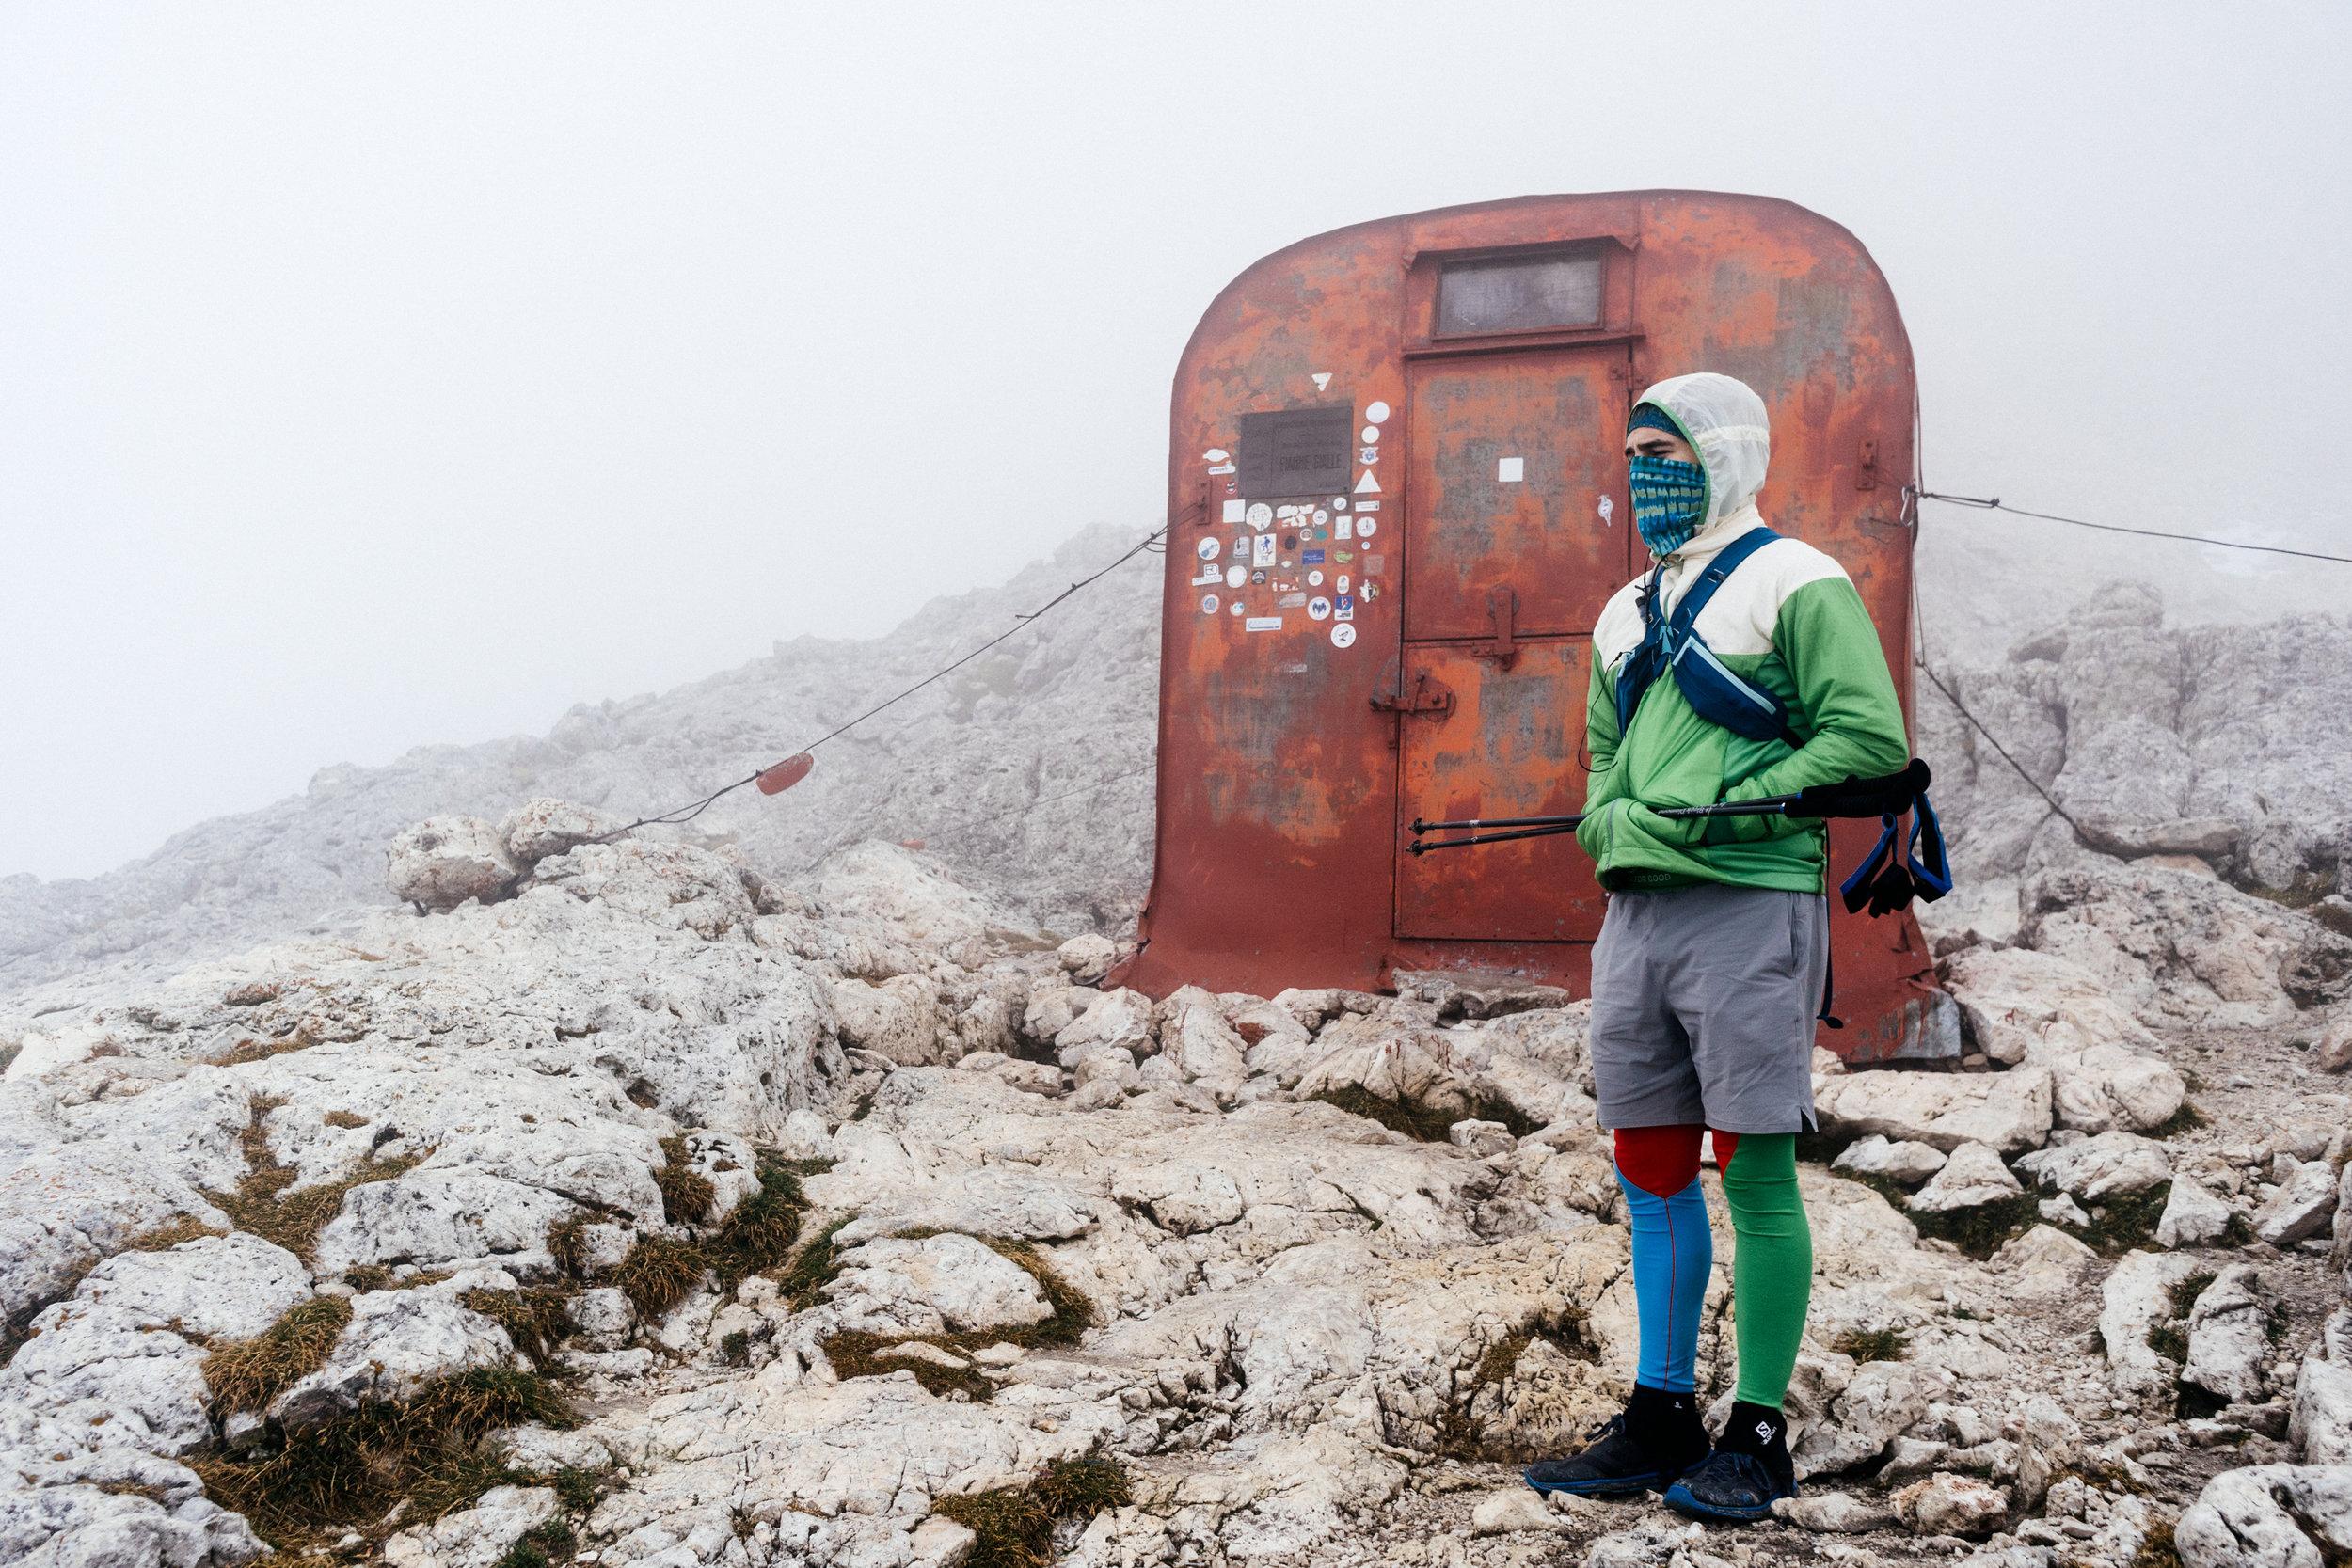 Dolomites-ChrisBrinleeJr-SEP17-72.jpg